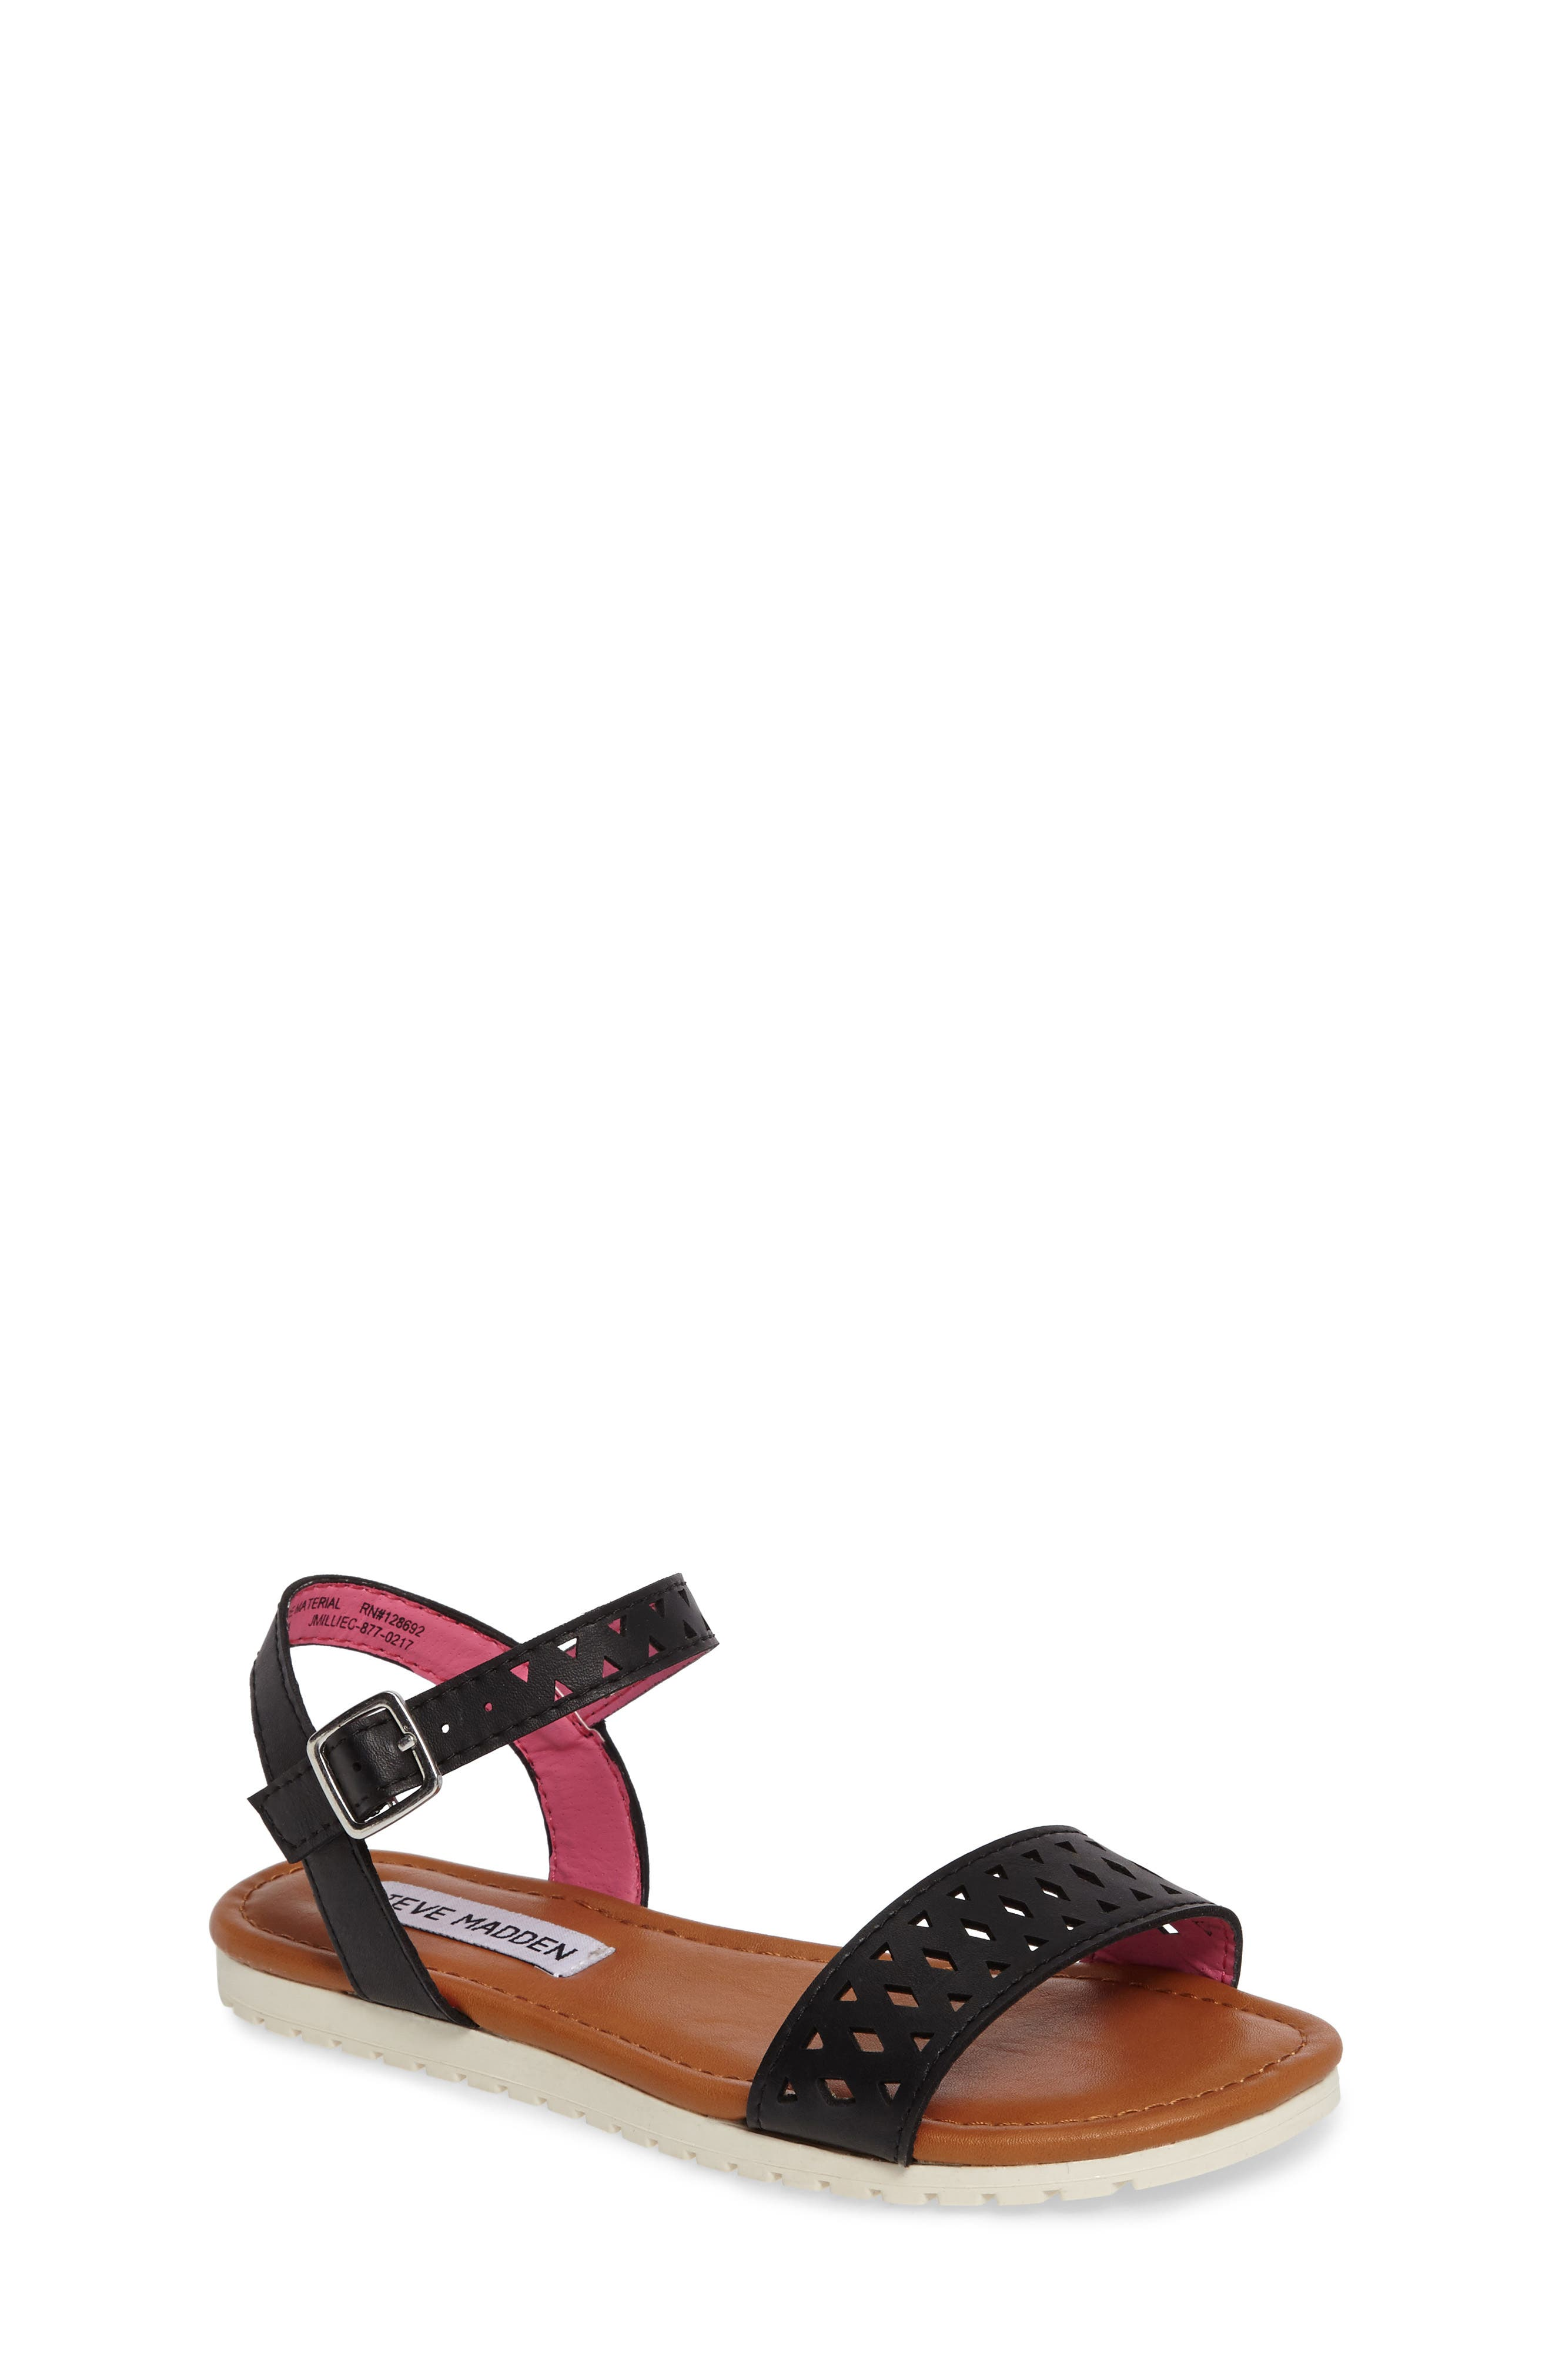 Steve Madden Millie Perforated Sandal (Toddler, Little Kid & Big Kid)